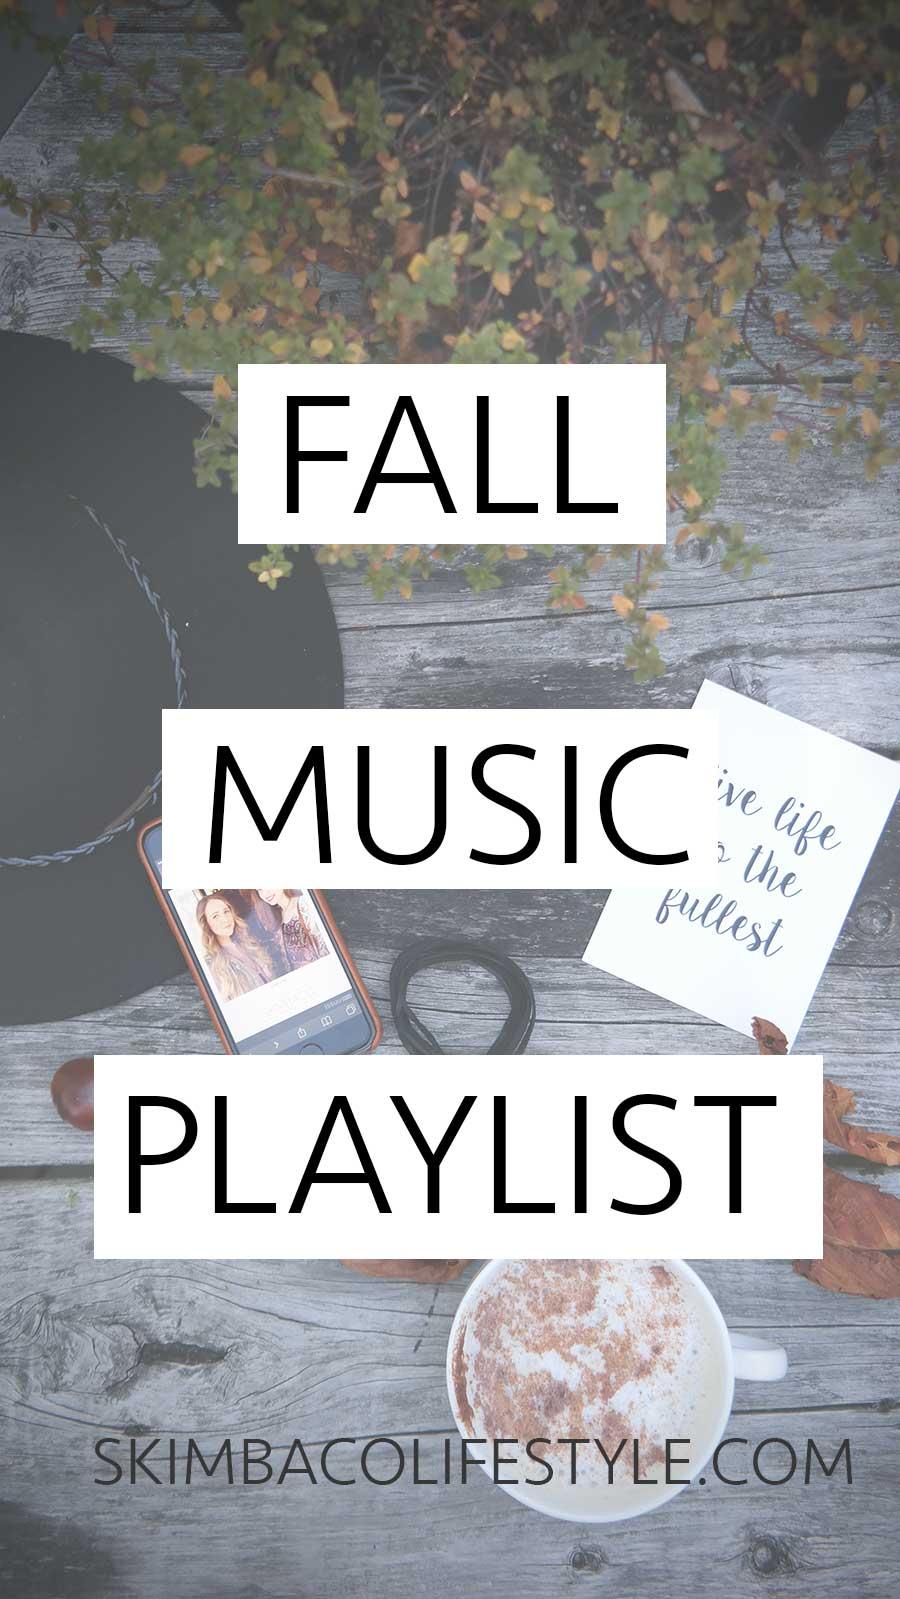 Fall Music Playlist 2016 via @skimbaco